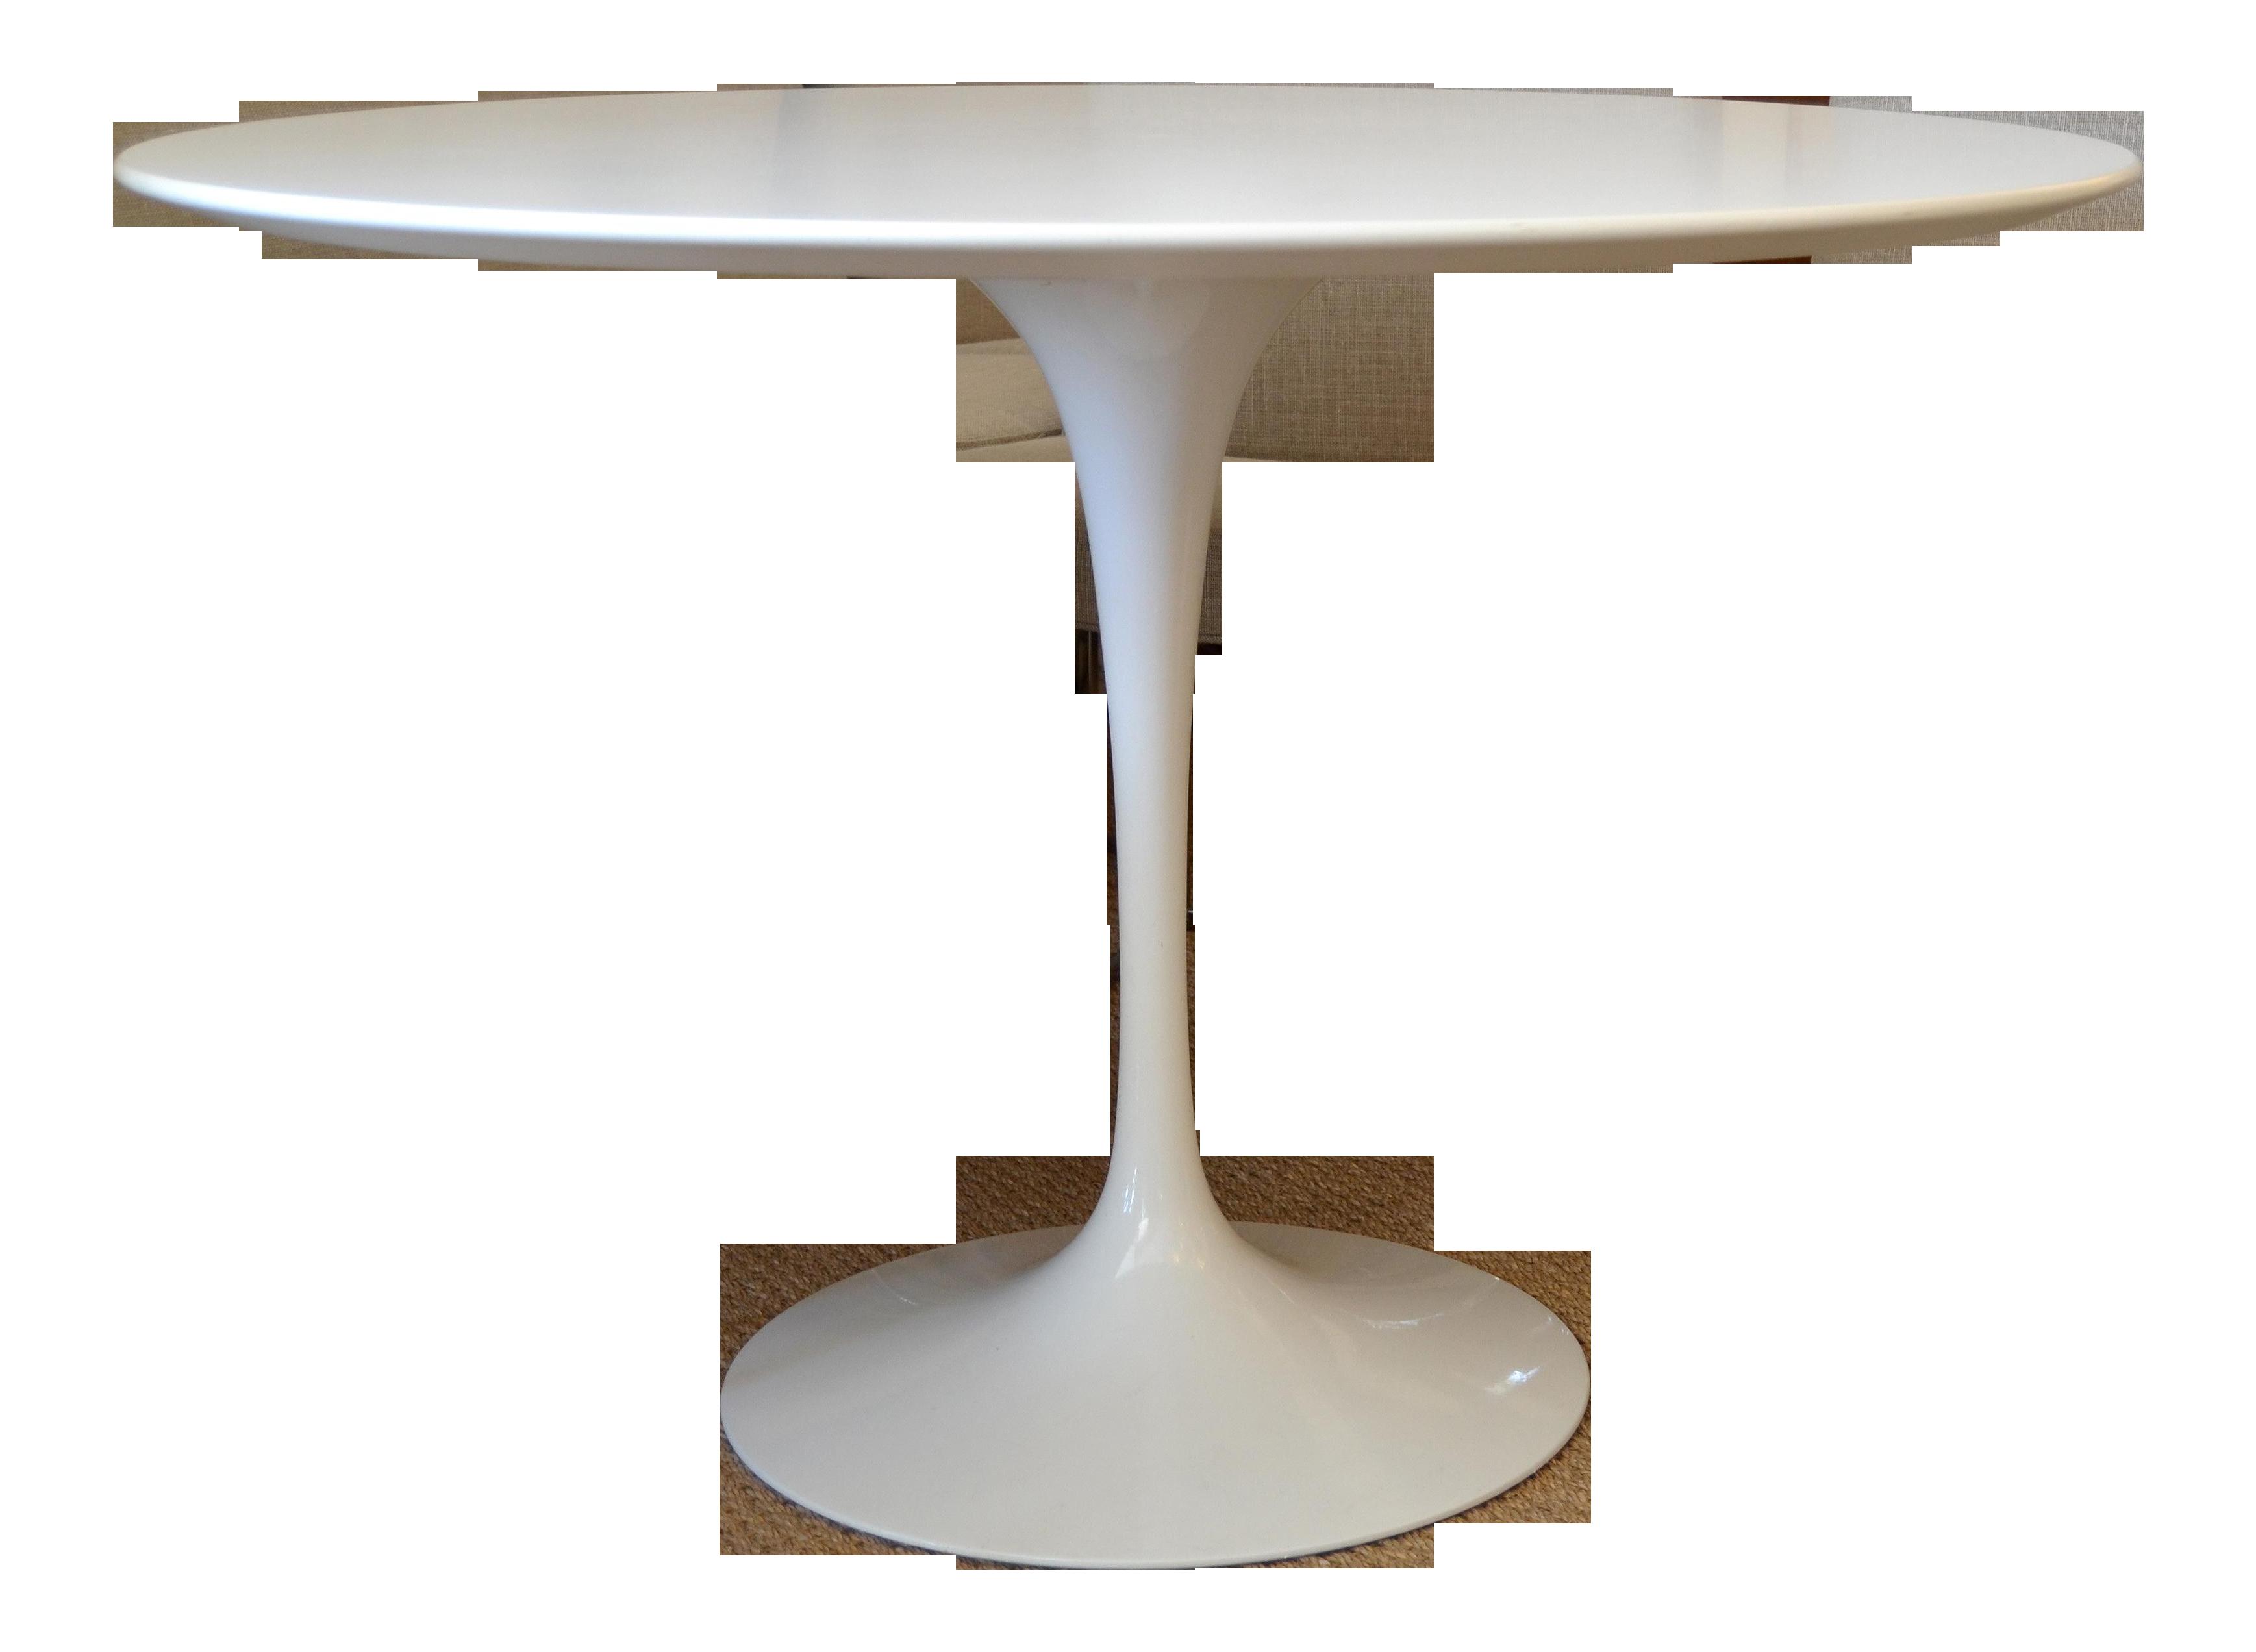 Delicieux Original Eero Saarinen Round Antique White Laminated Tulip Dining Table  Knoll